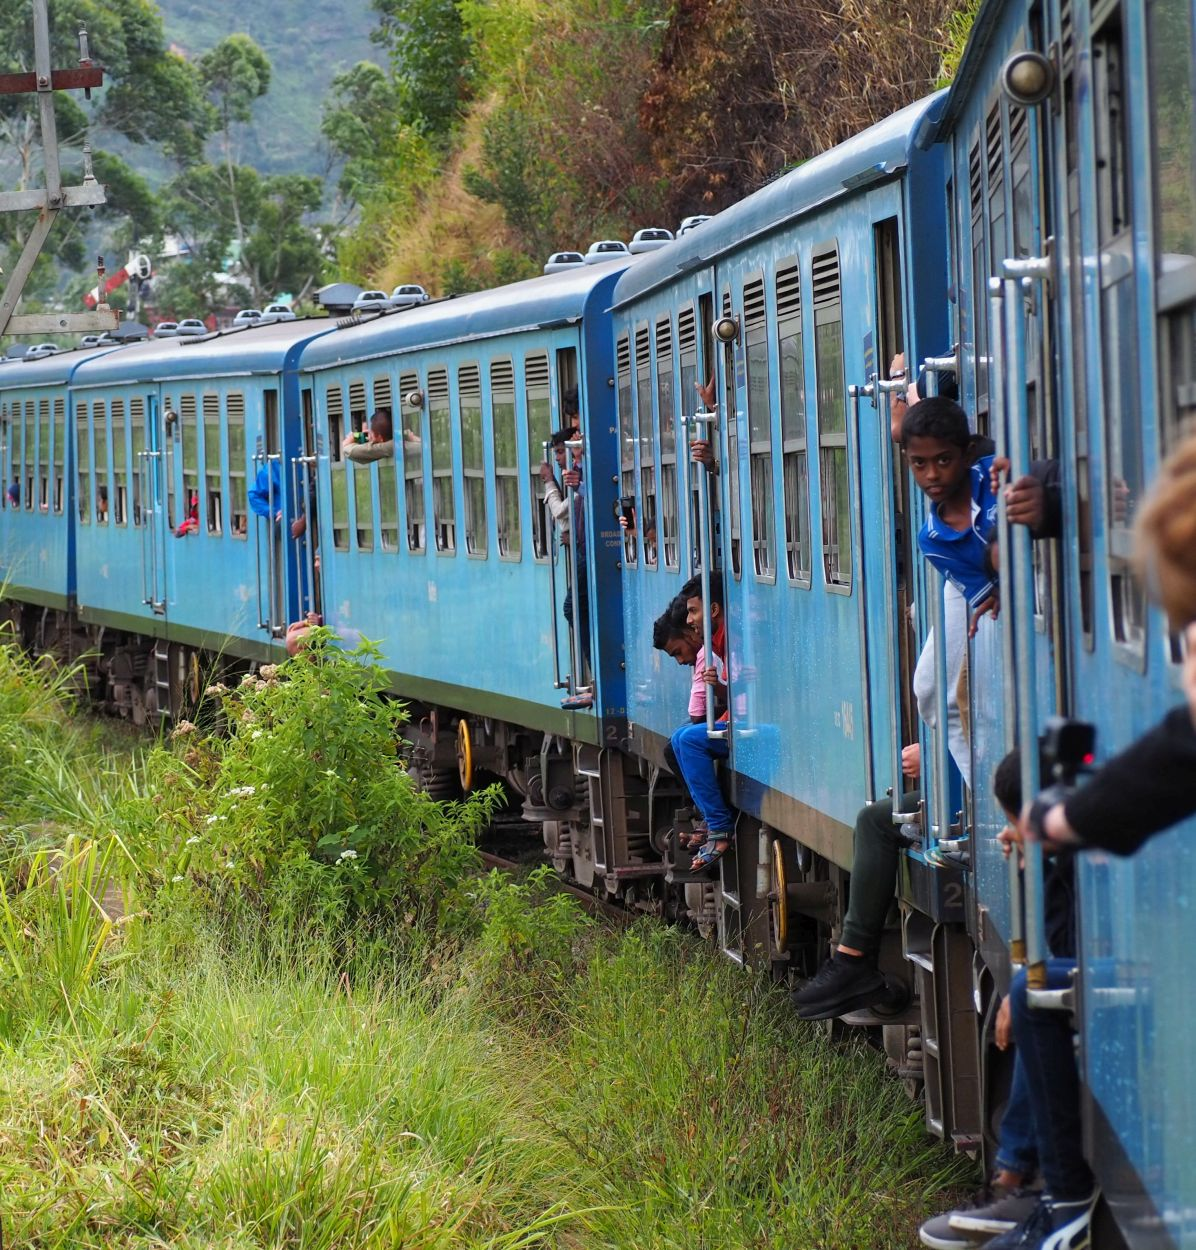 Unsere Zugfahrt durch Sri Lanka von Nanu-Oya nach Ella